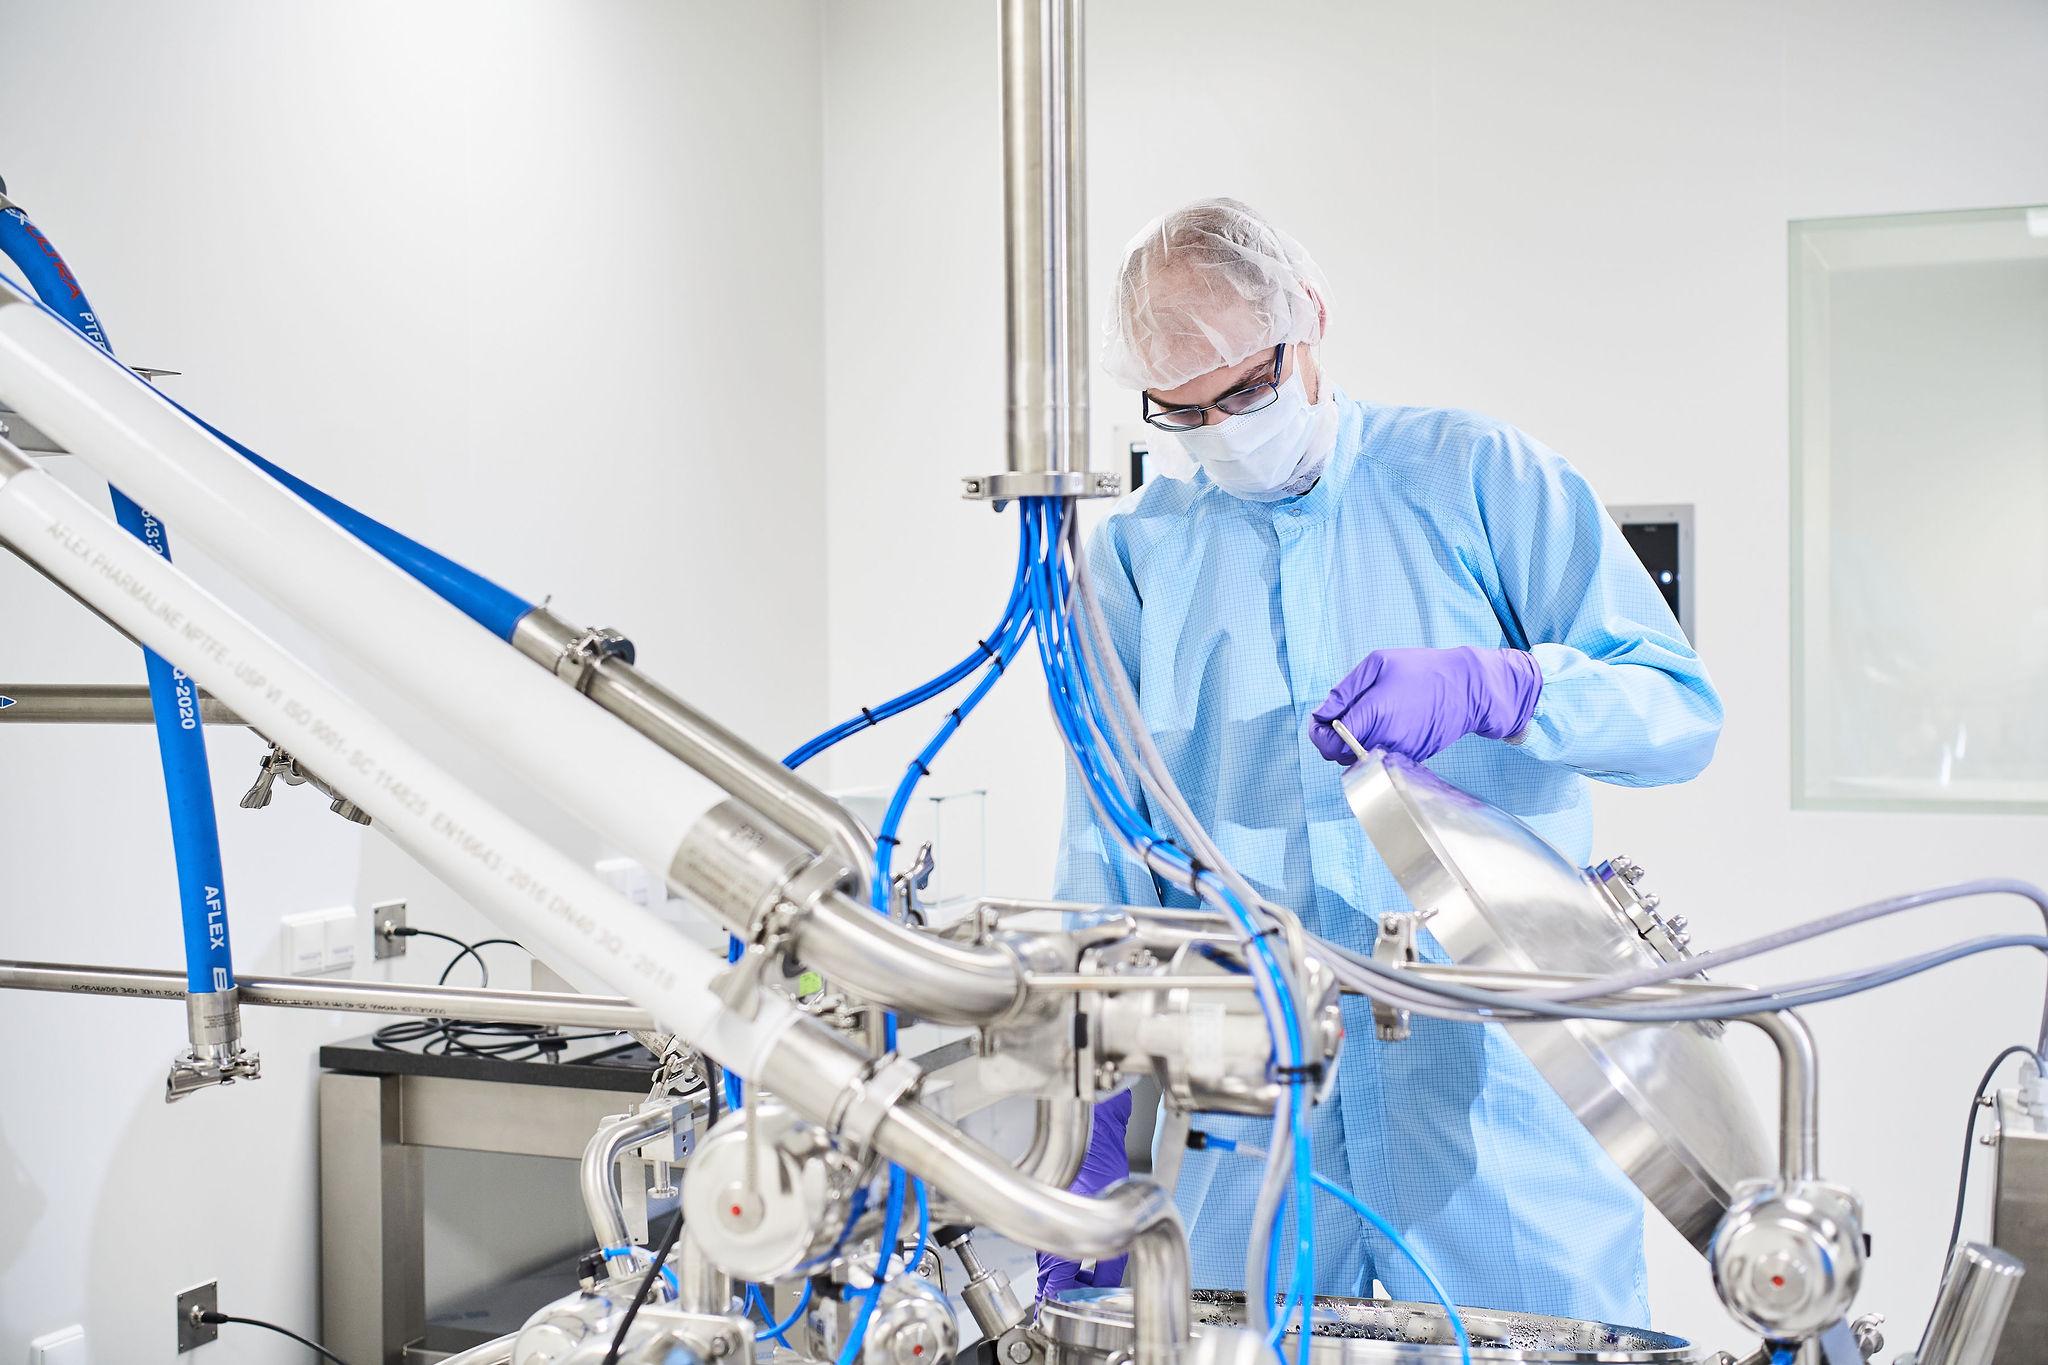 Sterile Process Specialist